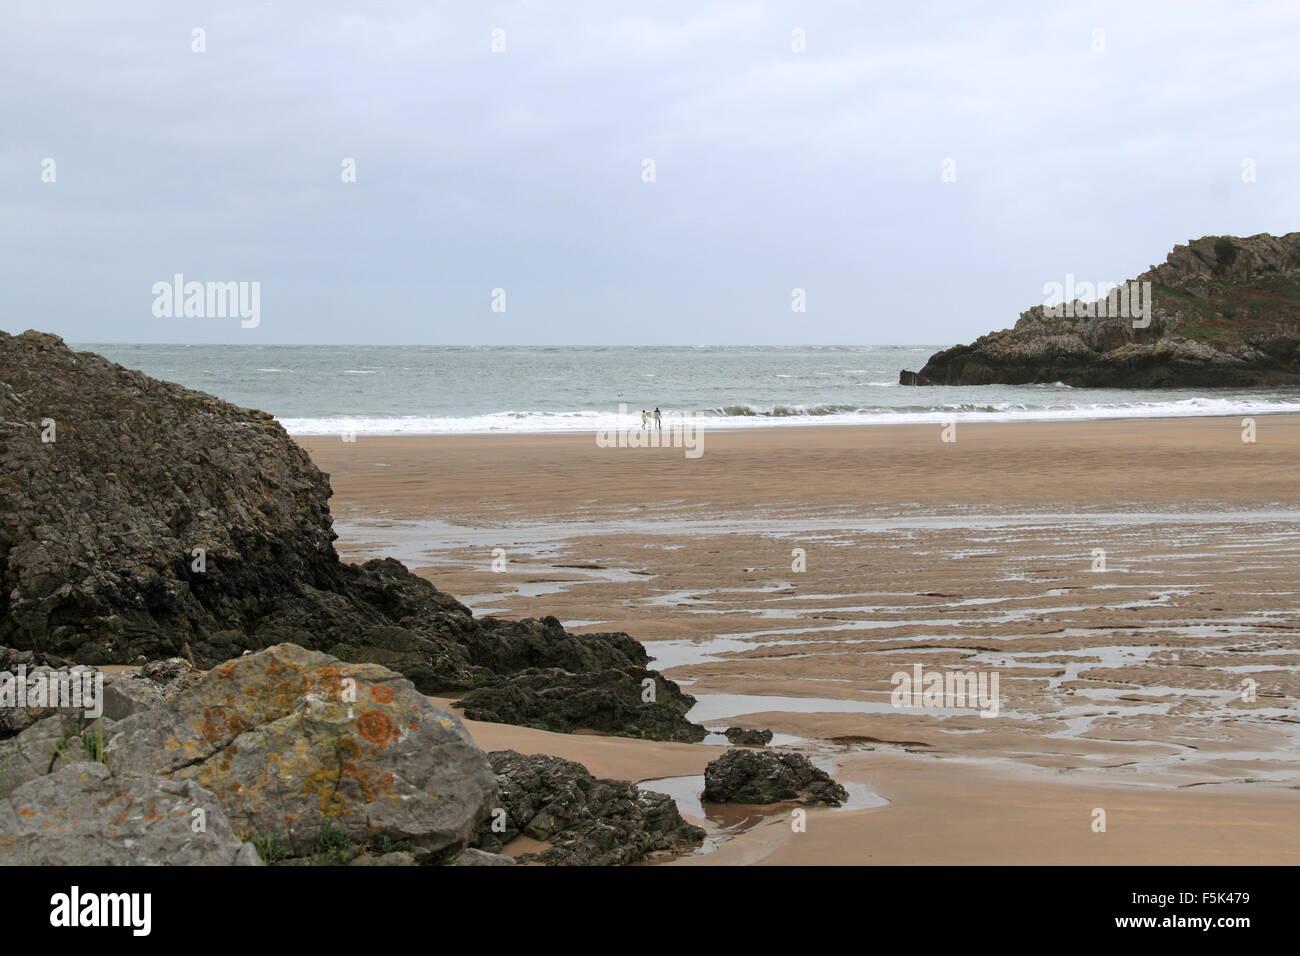 Broad Haven South beach, Bosherston, Pembrokeshire, Dyfed, Wales, Great Britain, United Kingdom, UK, Europe - Stock Image